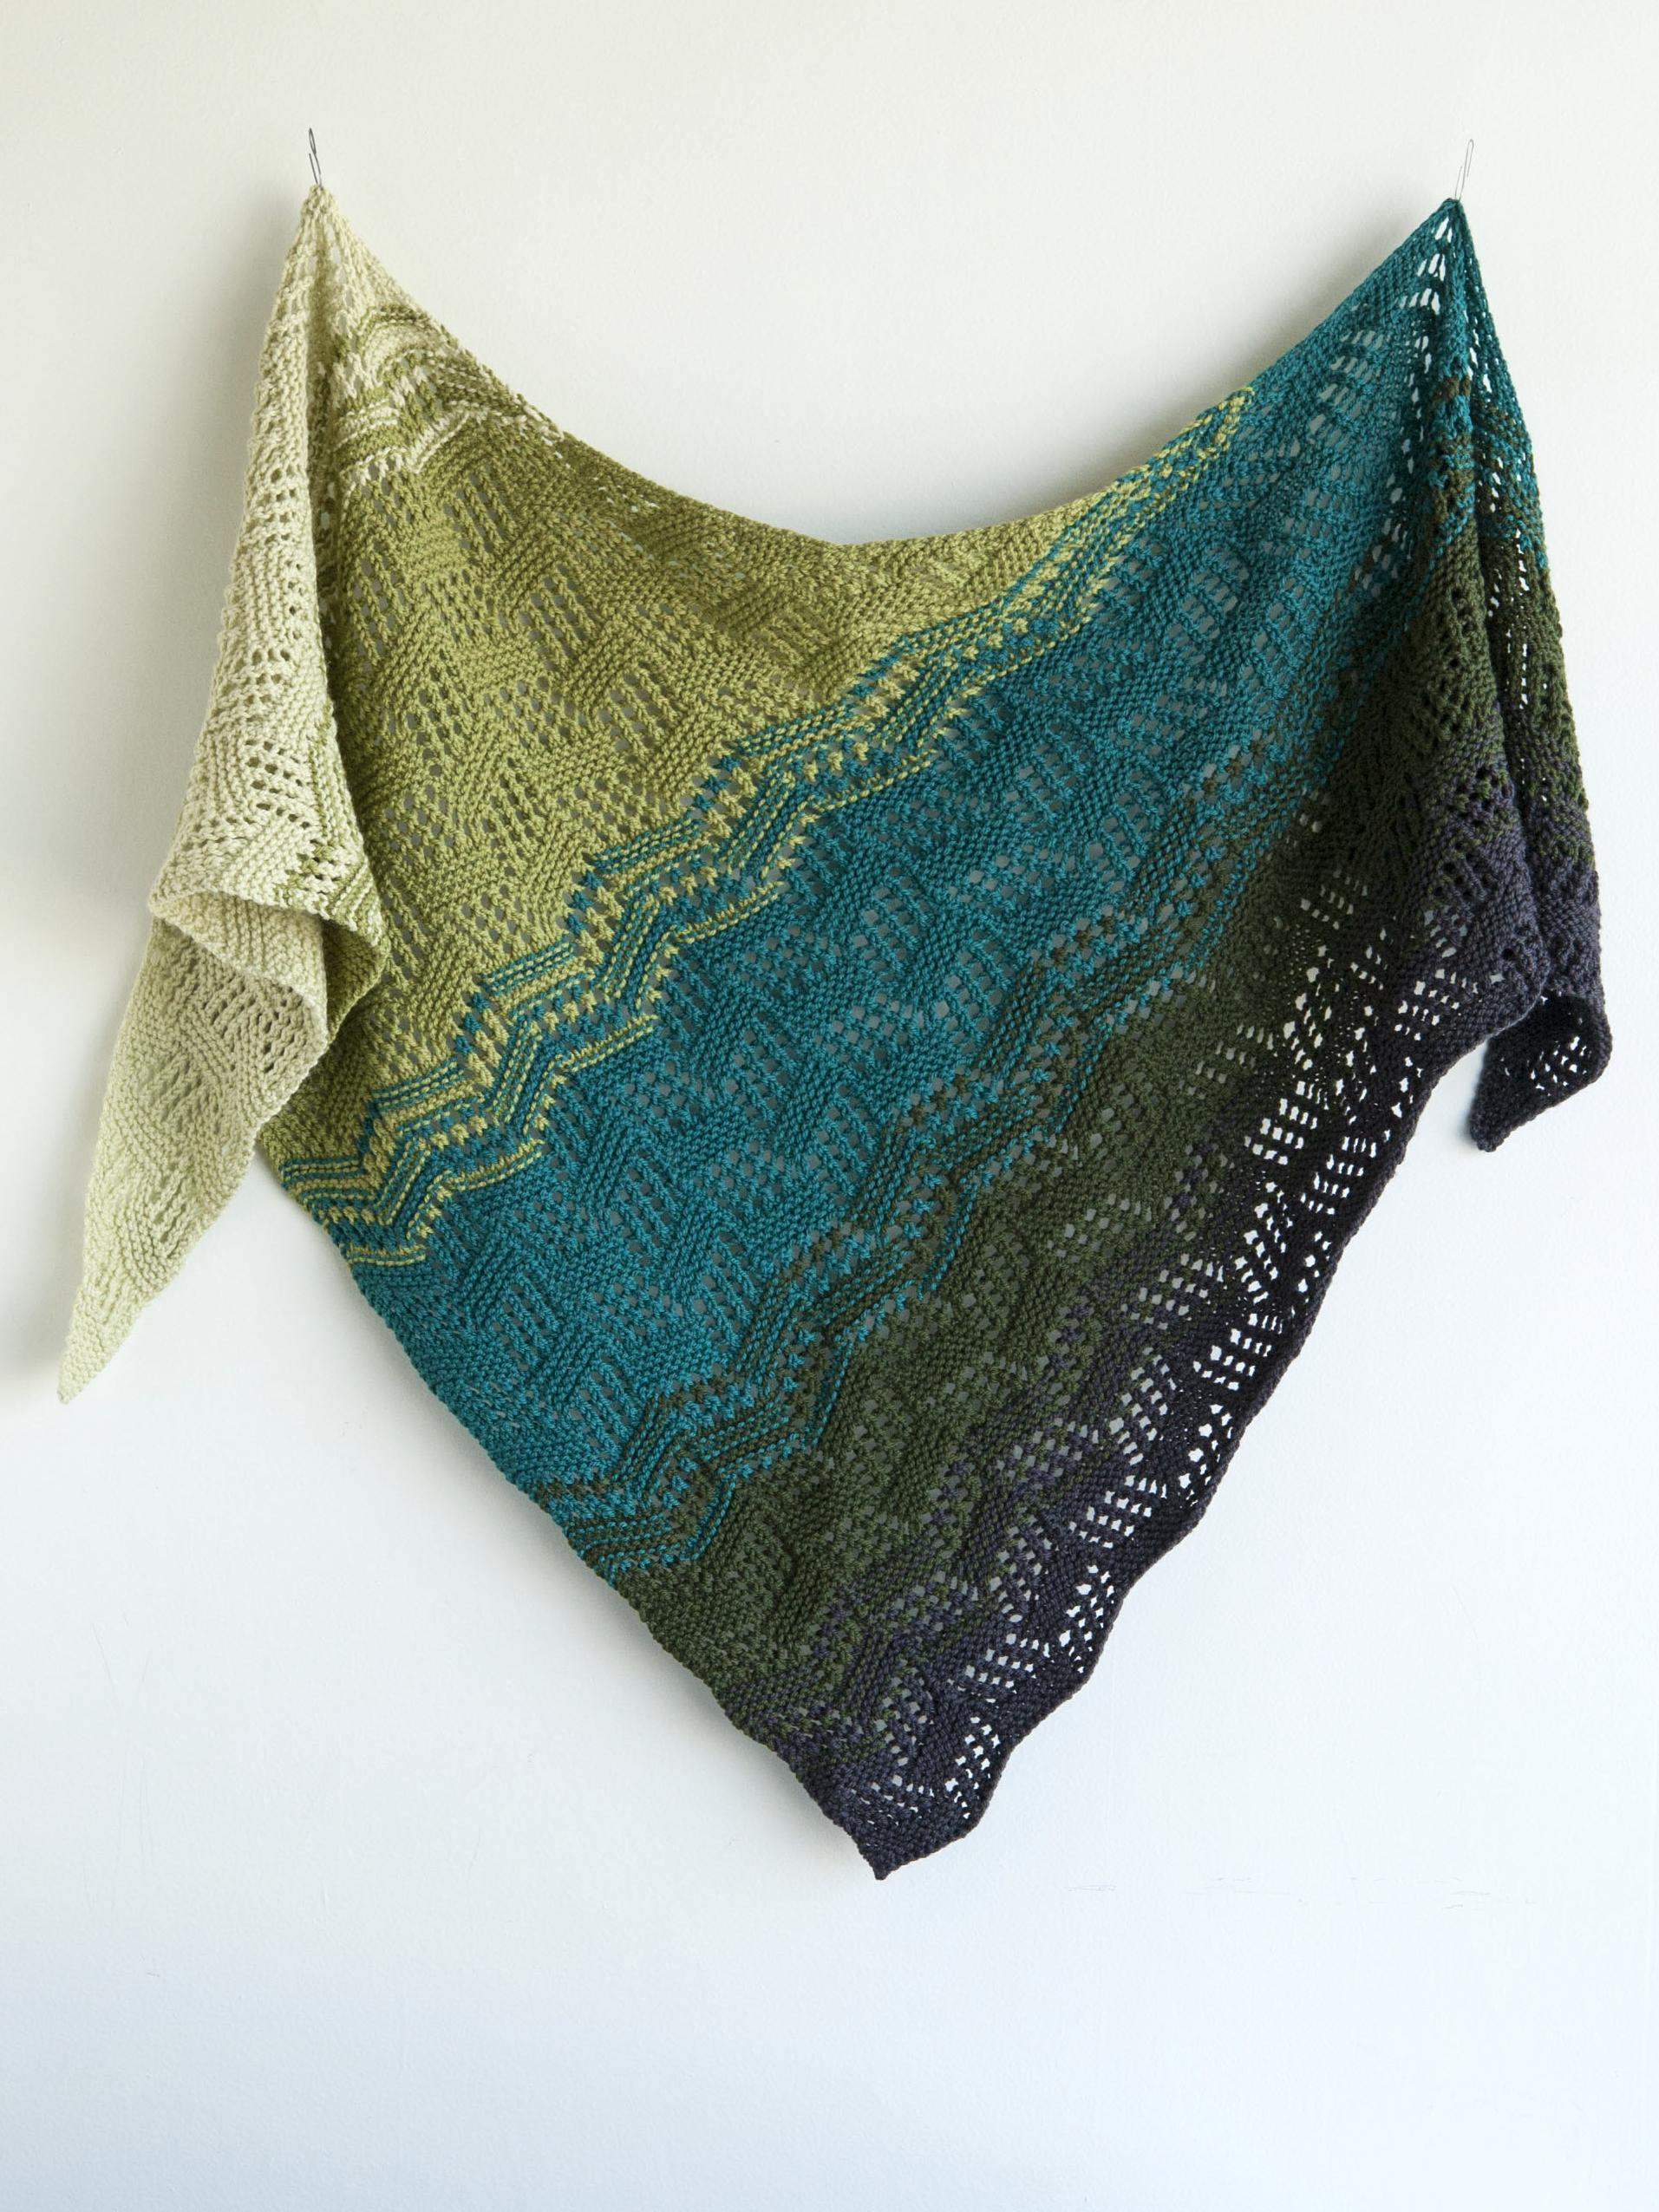 Tilted Tiles shawl knitting pattern